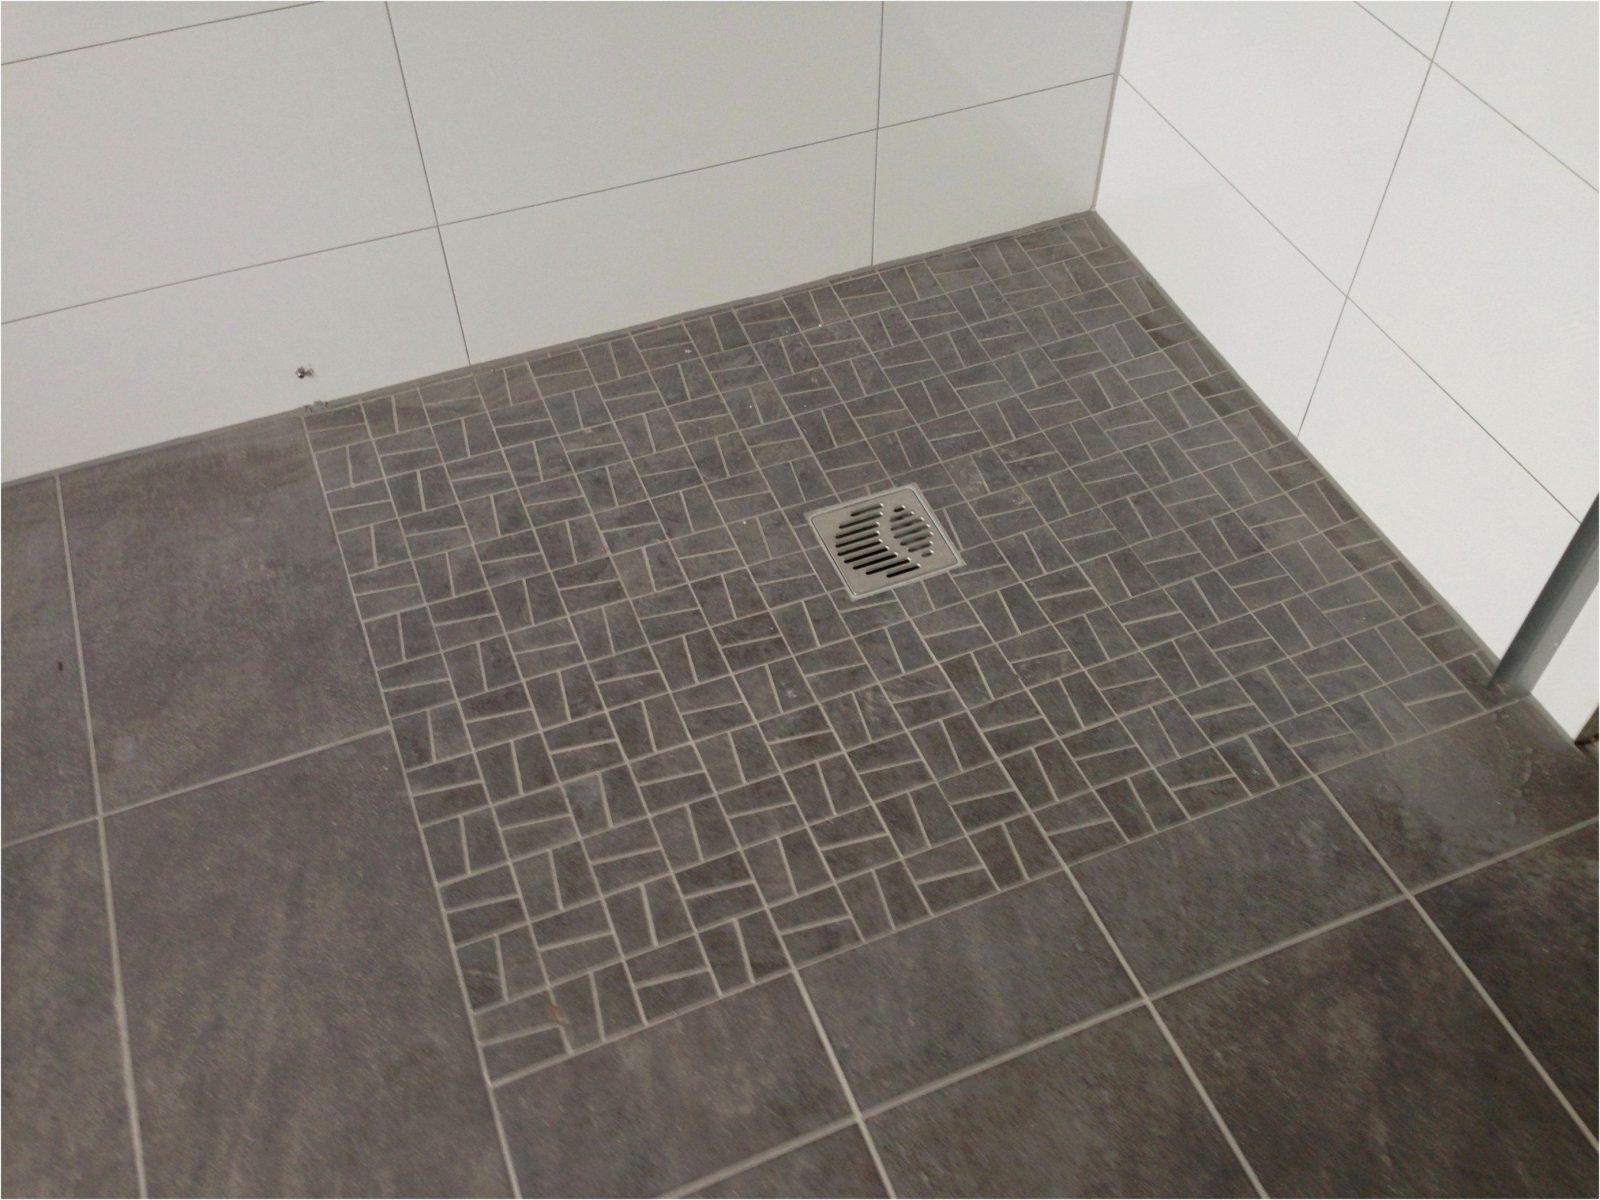 Fliesen Mosaik Atemberaubend Muster Über Fliesen Mosaik Mit Designs von Mosaik Fliesen Dusche Boden Bild